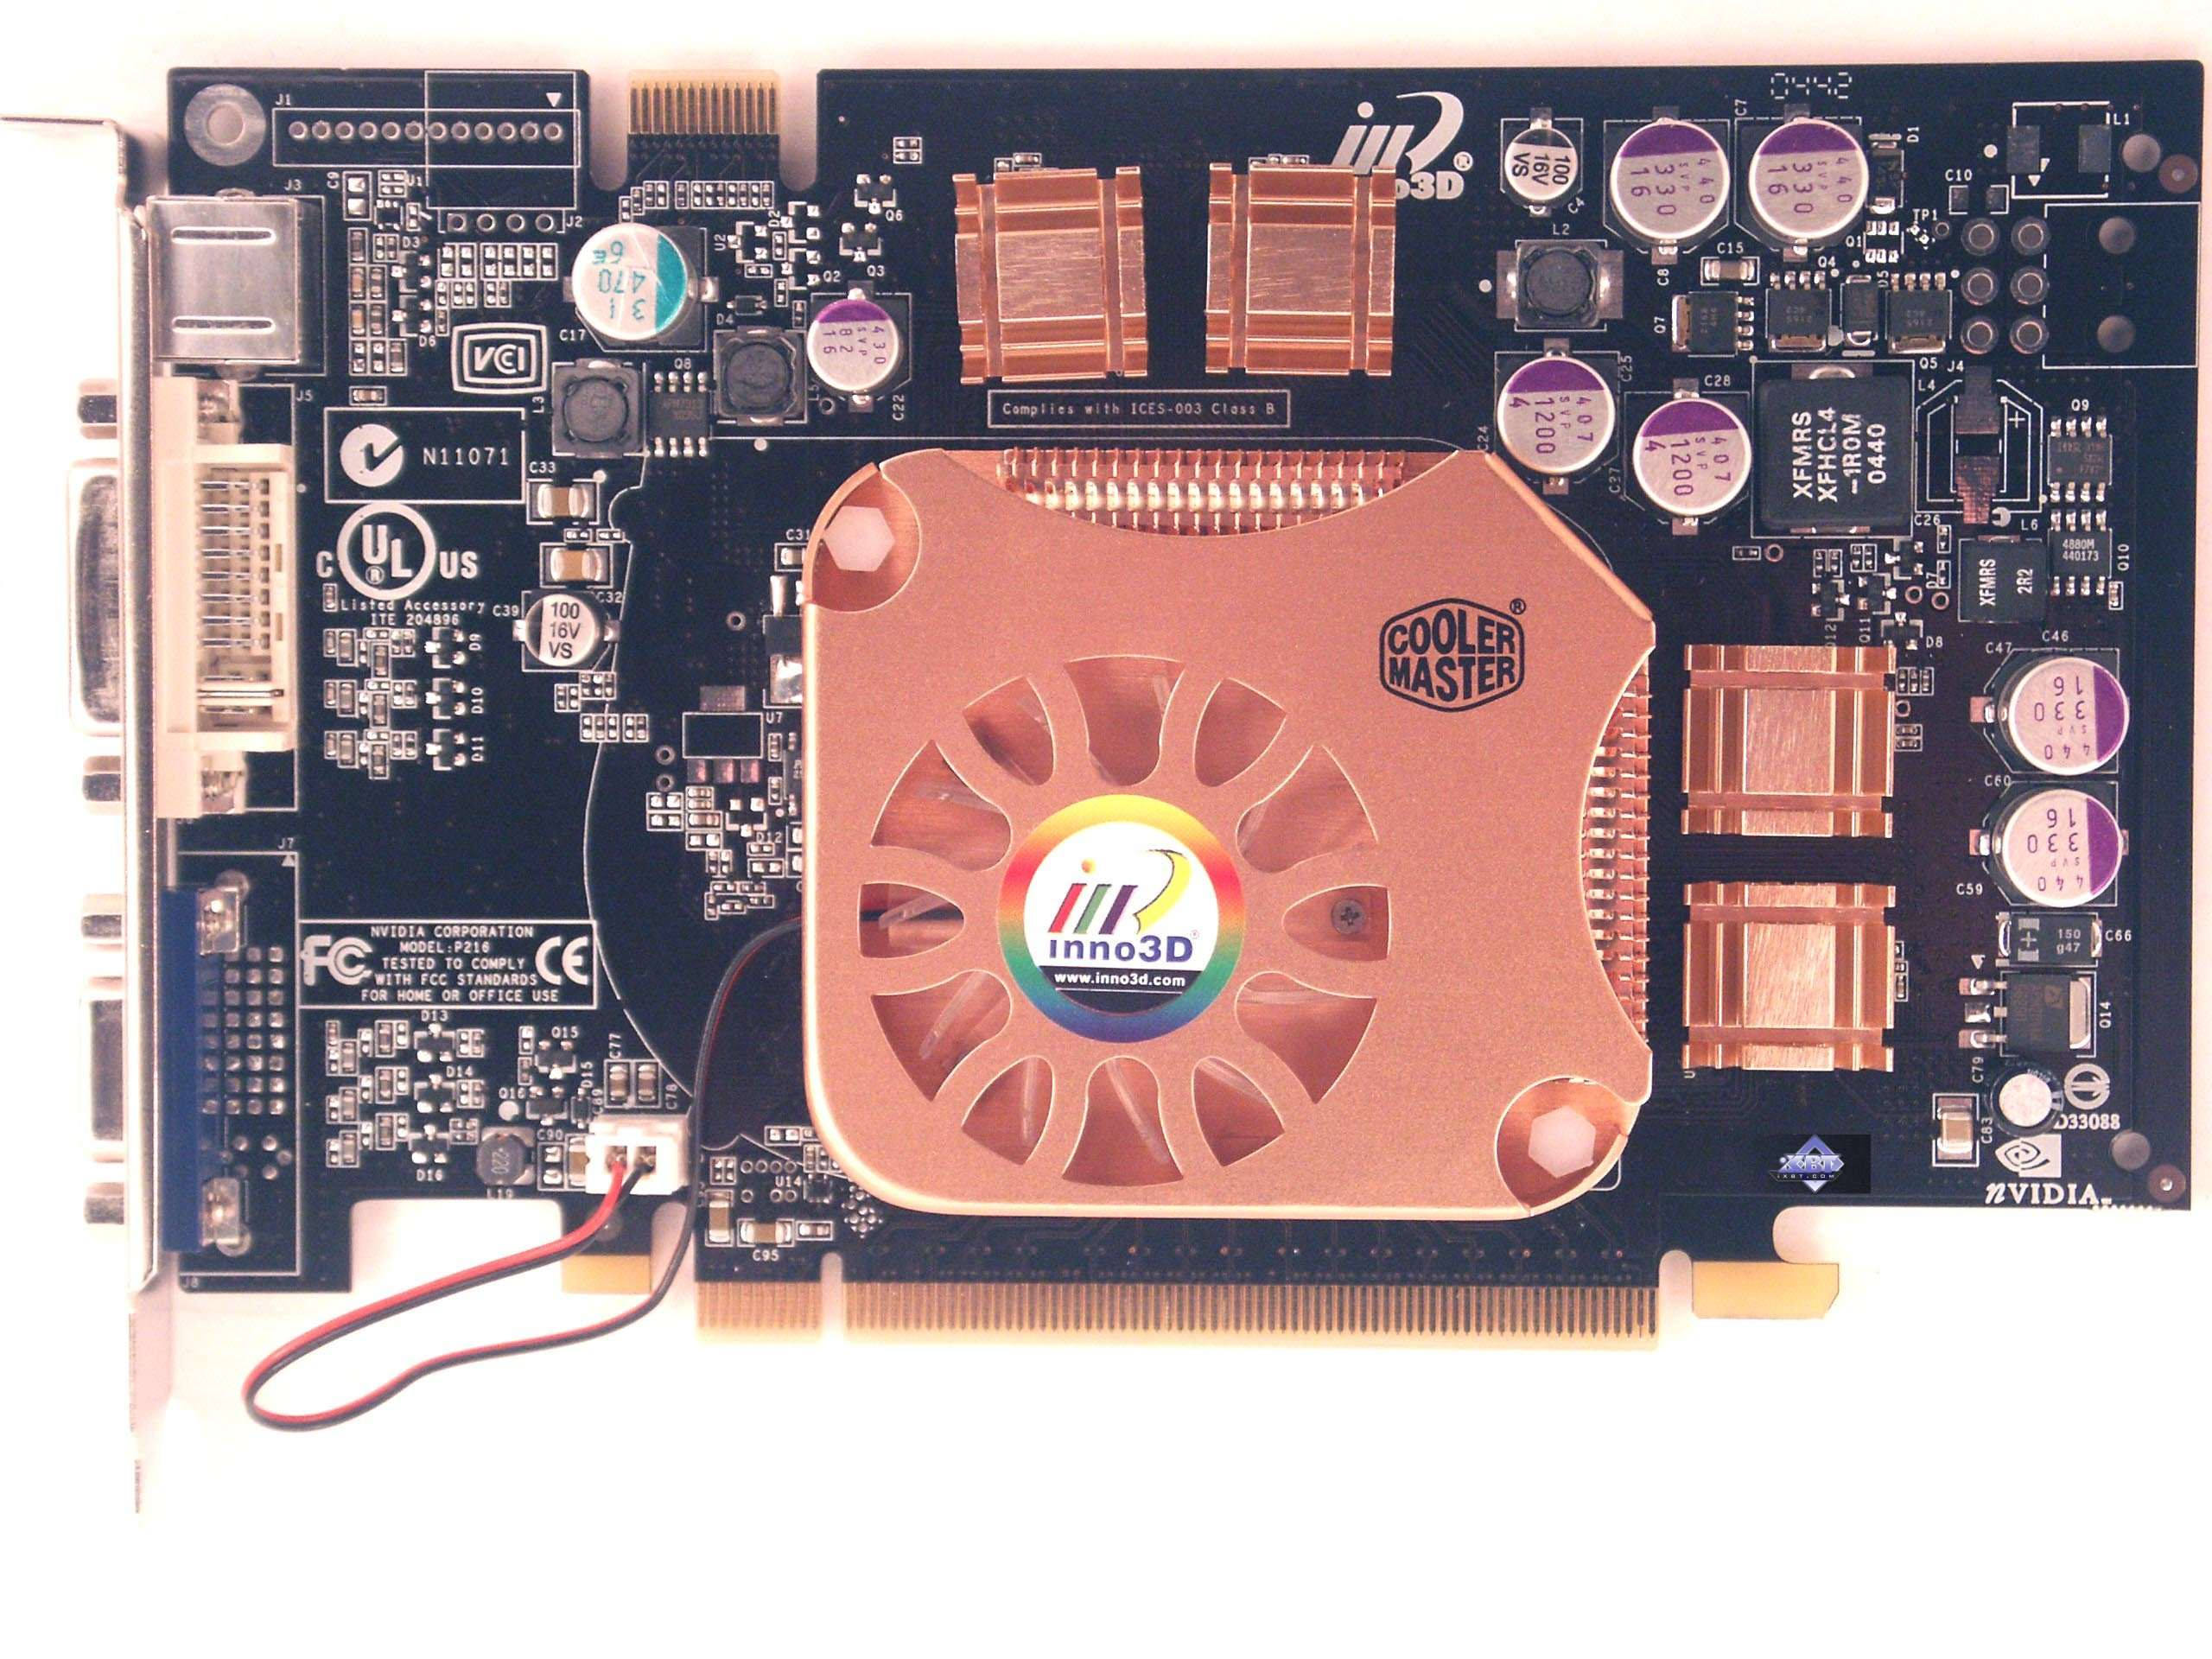 Palit 6600 Gt Driver